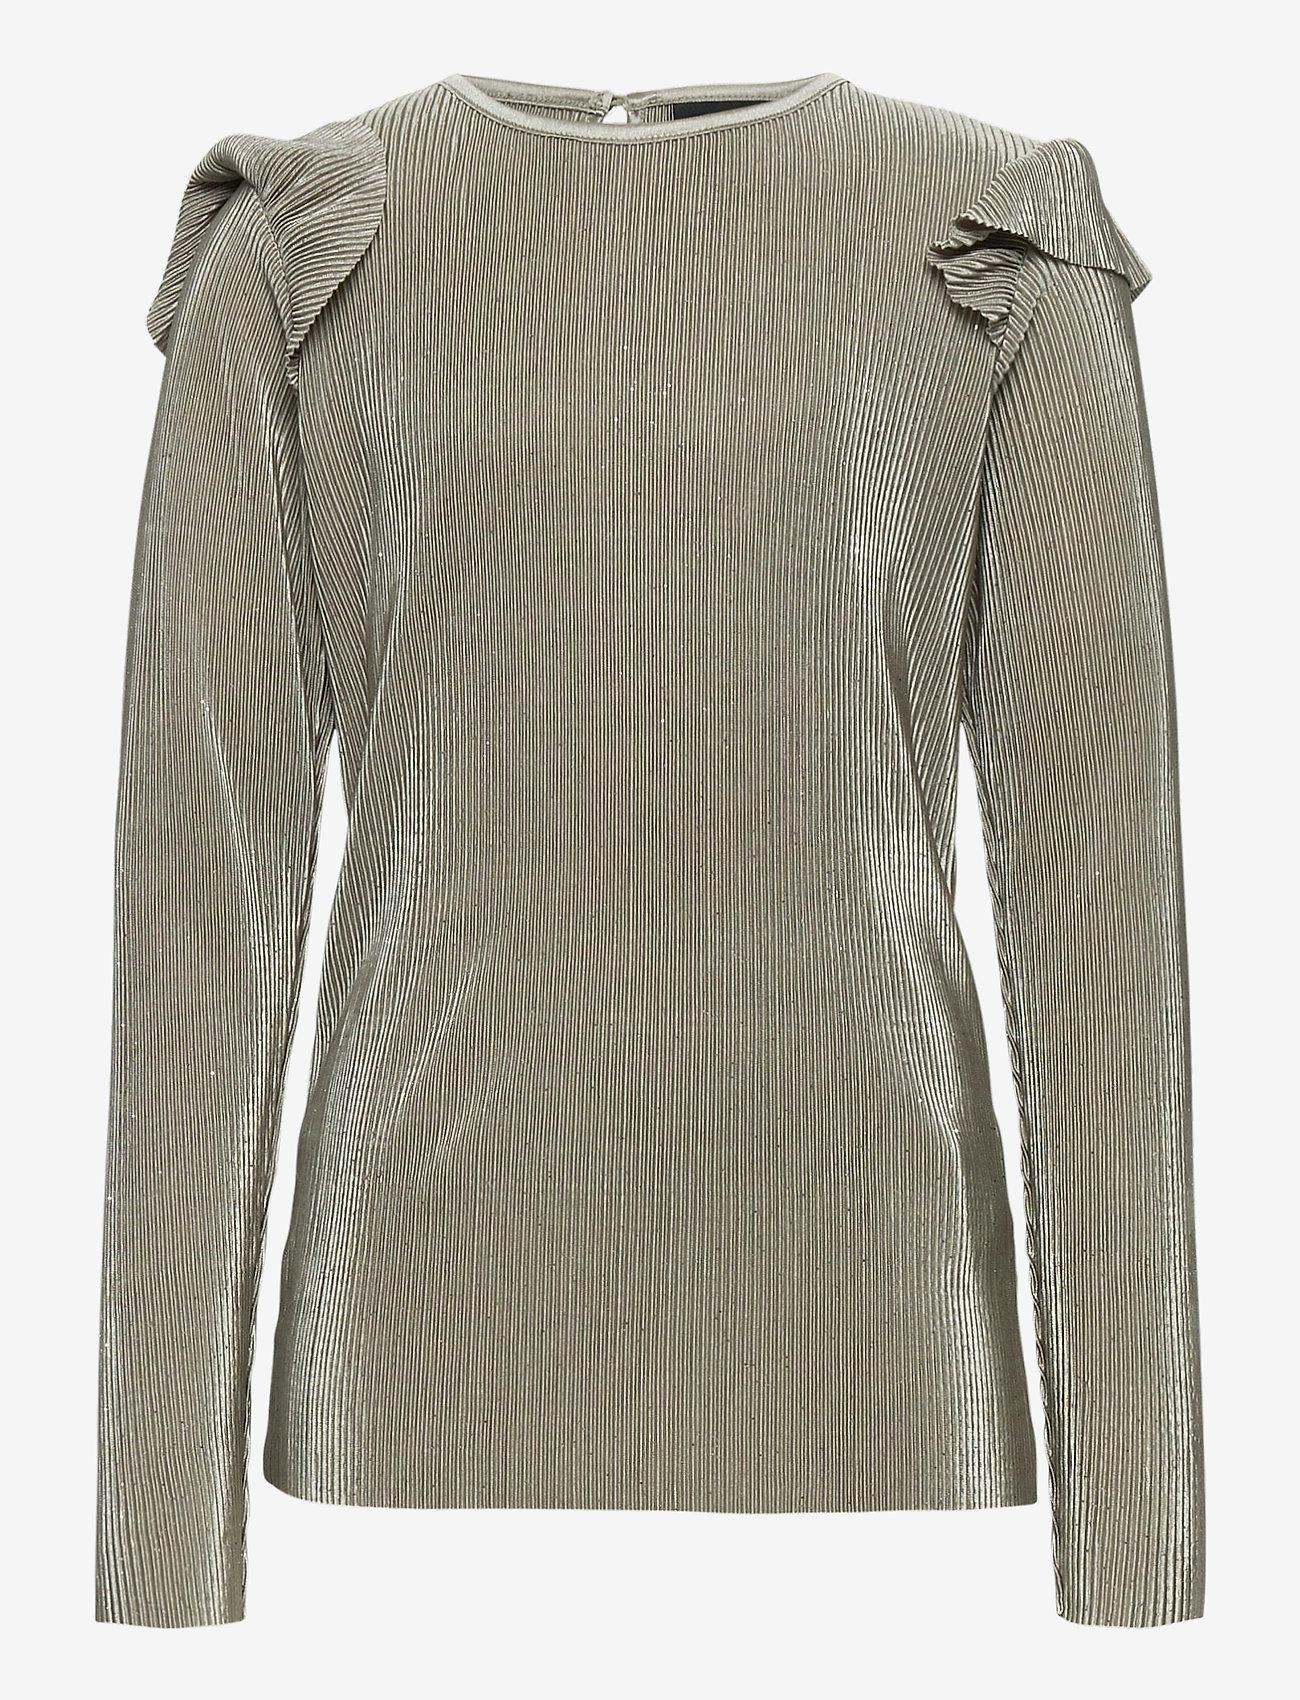 Petit by Sofie Schnoor - Blouse - bluser & tunikaer - grey - 0